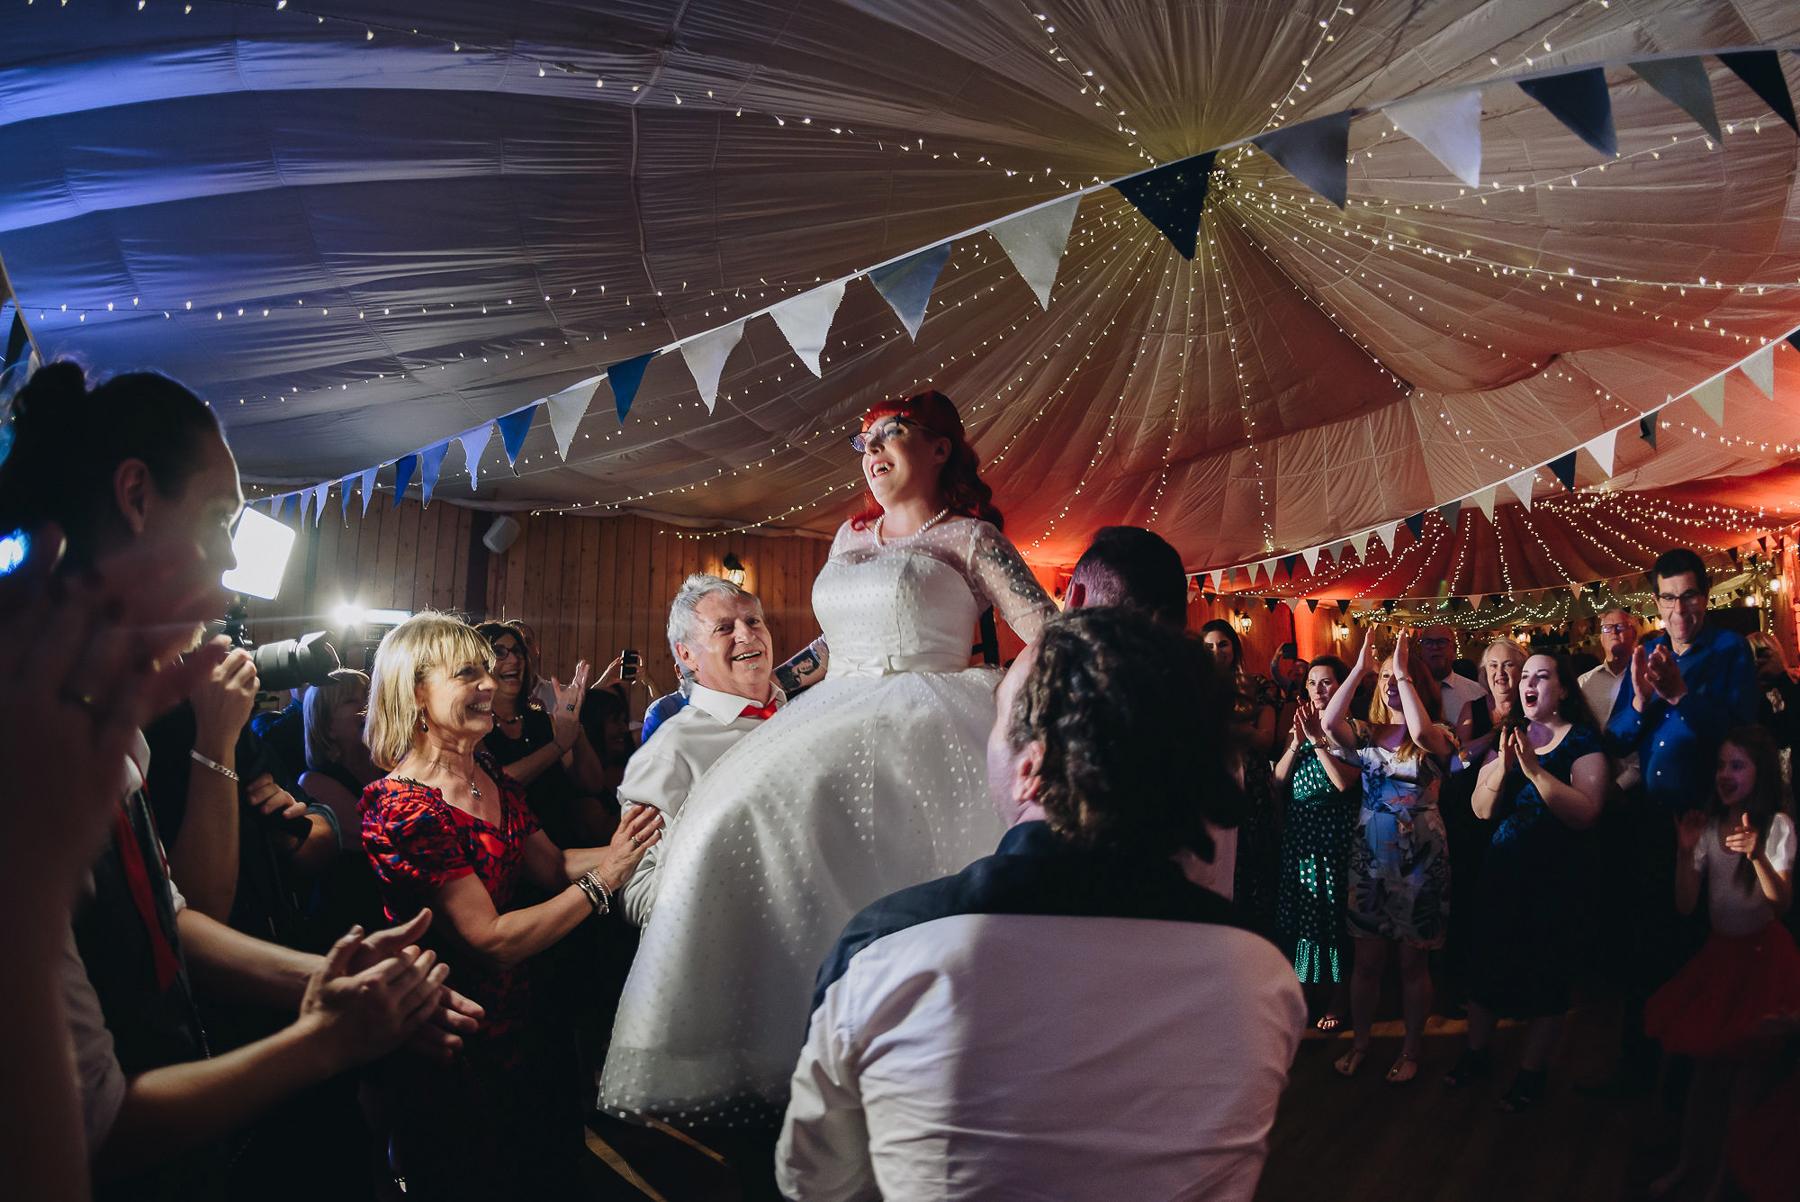 Wellbeing_Farm_Wedding_Photography_The_Pin-Up_Bride_Lara_Shaun-170.jpg